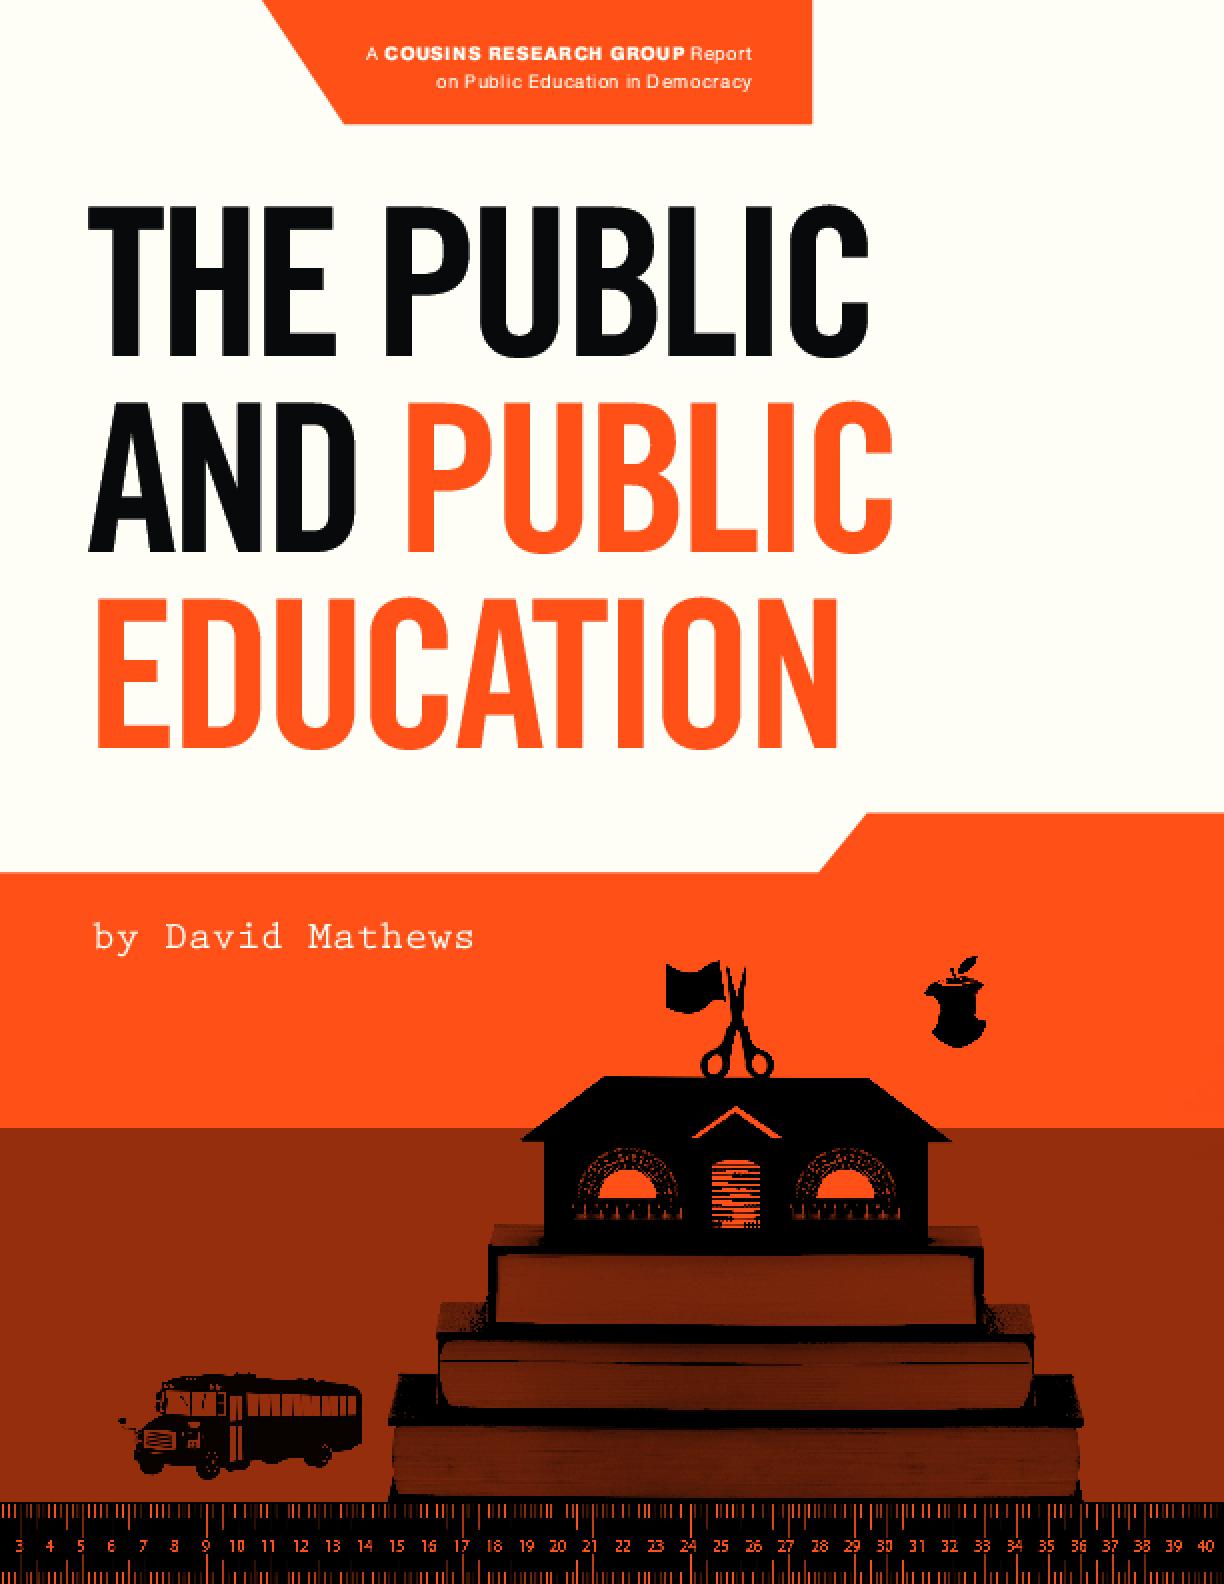 The Public and Public Education